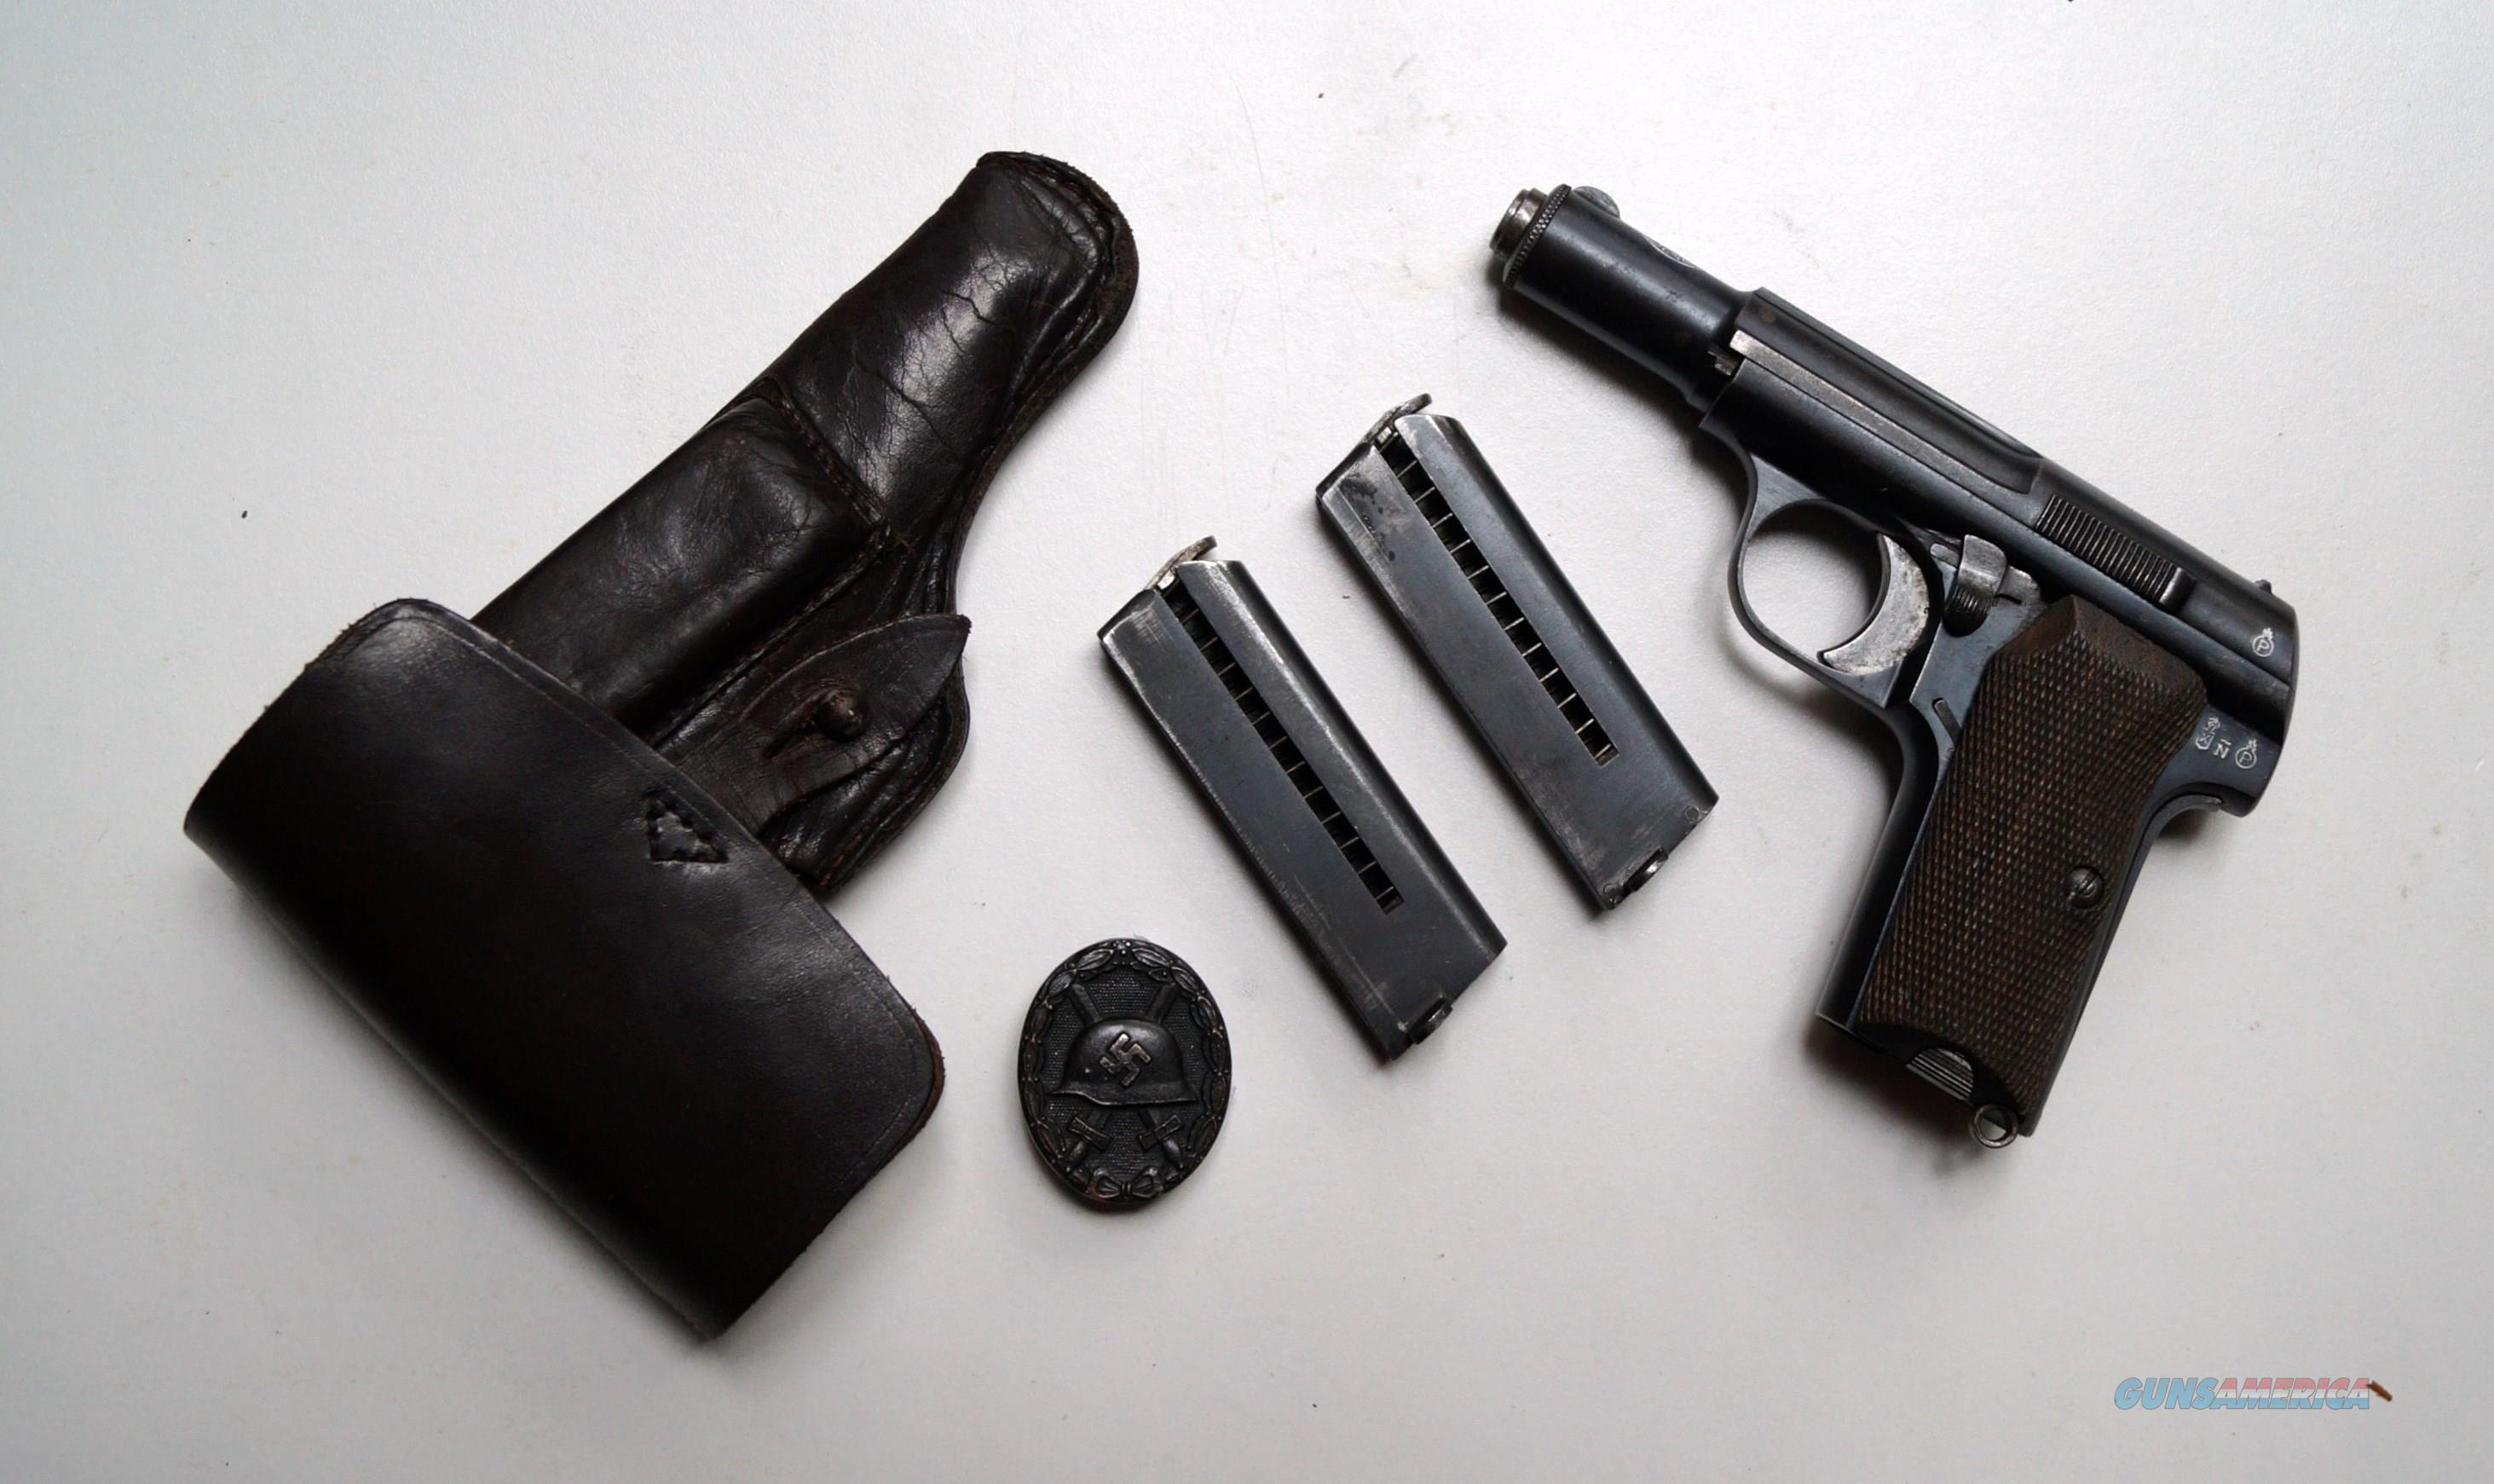 ASTRA 300 / NAZI MARKED / RIG  Guns > Pistols > Astra Pistols